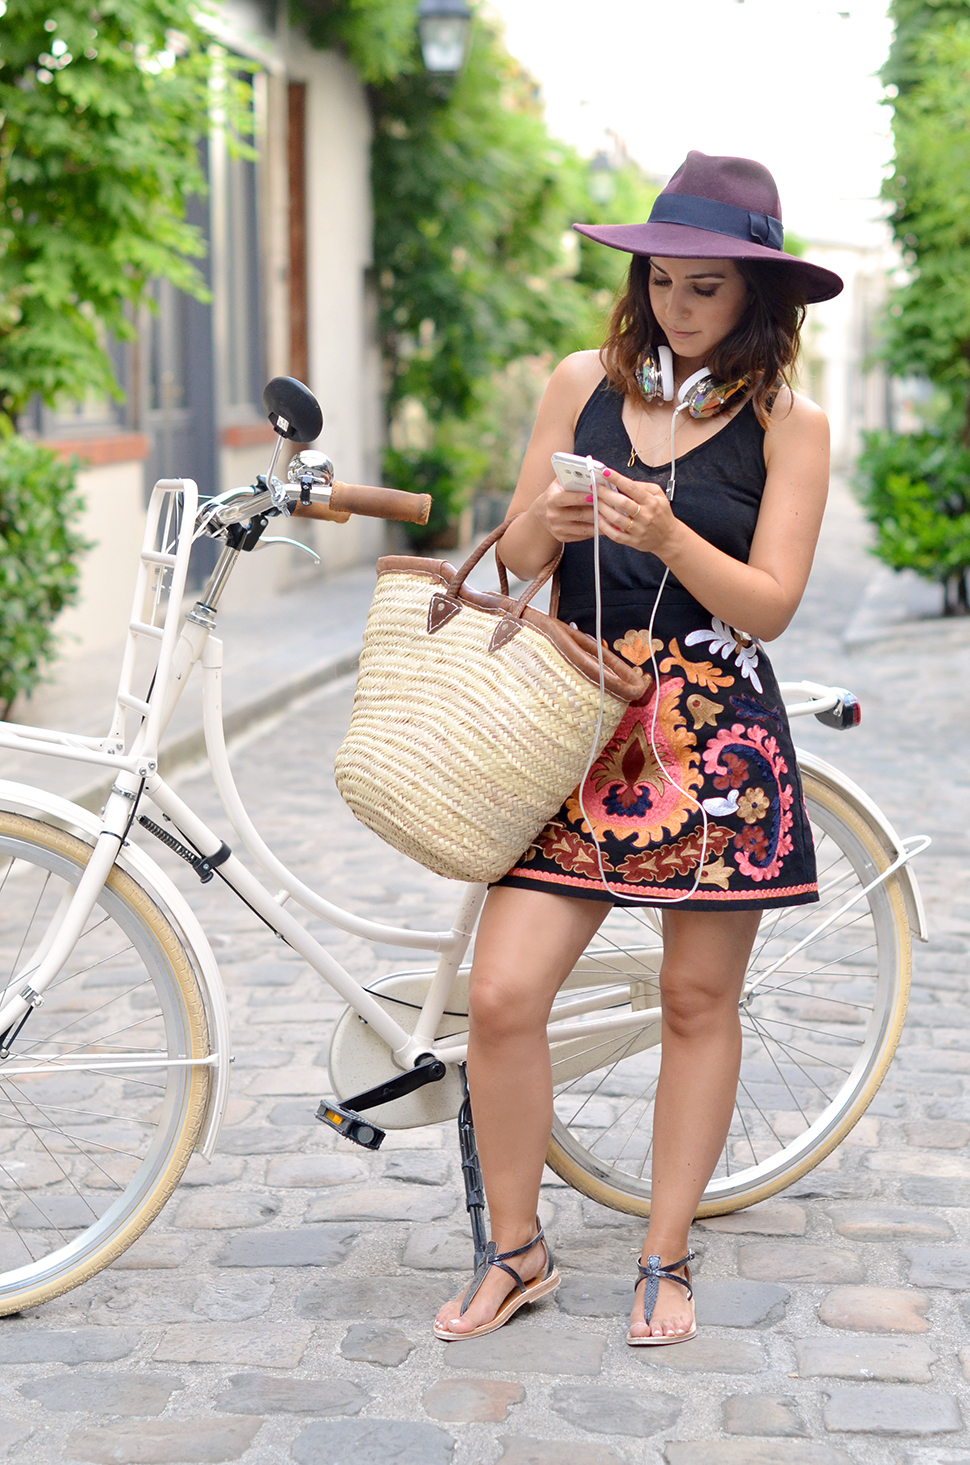 Helloitsvalentine_bike_paris_2